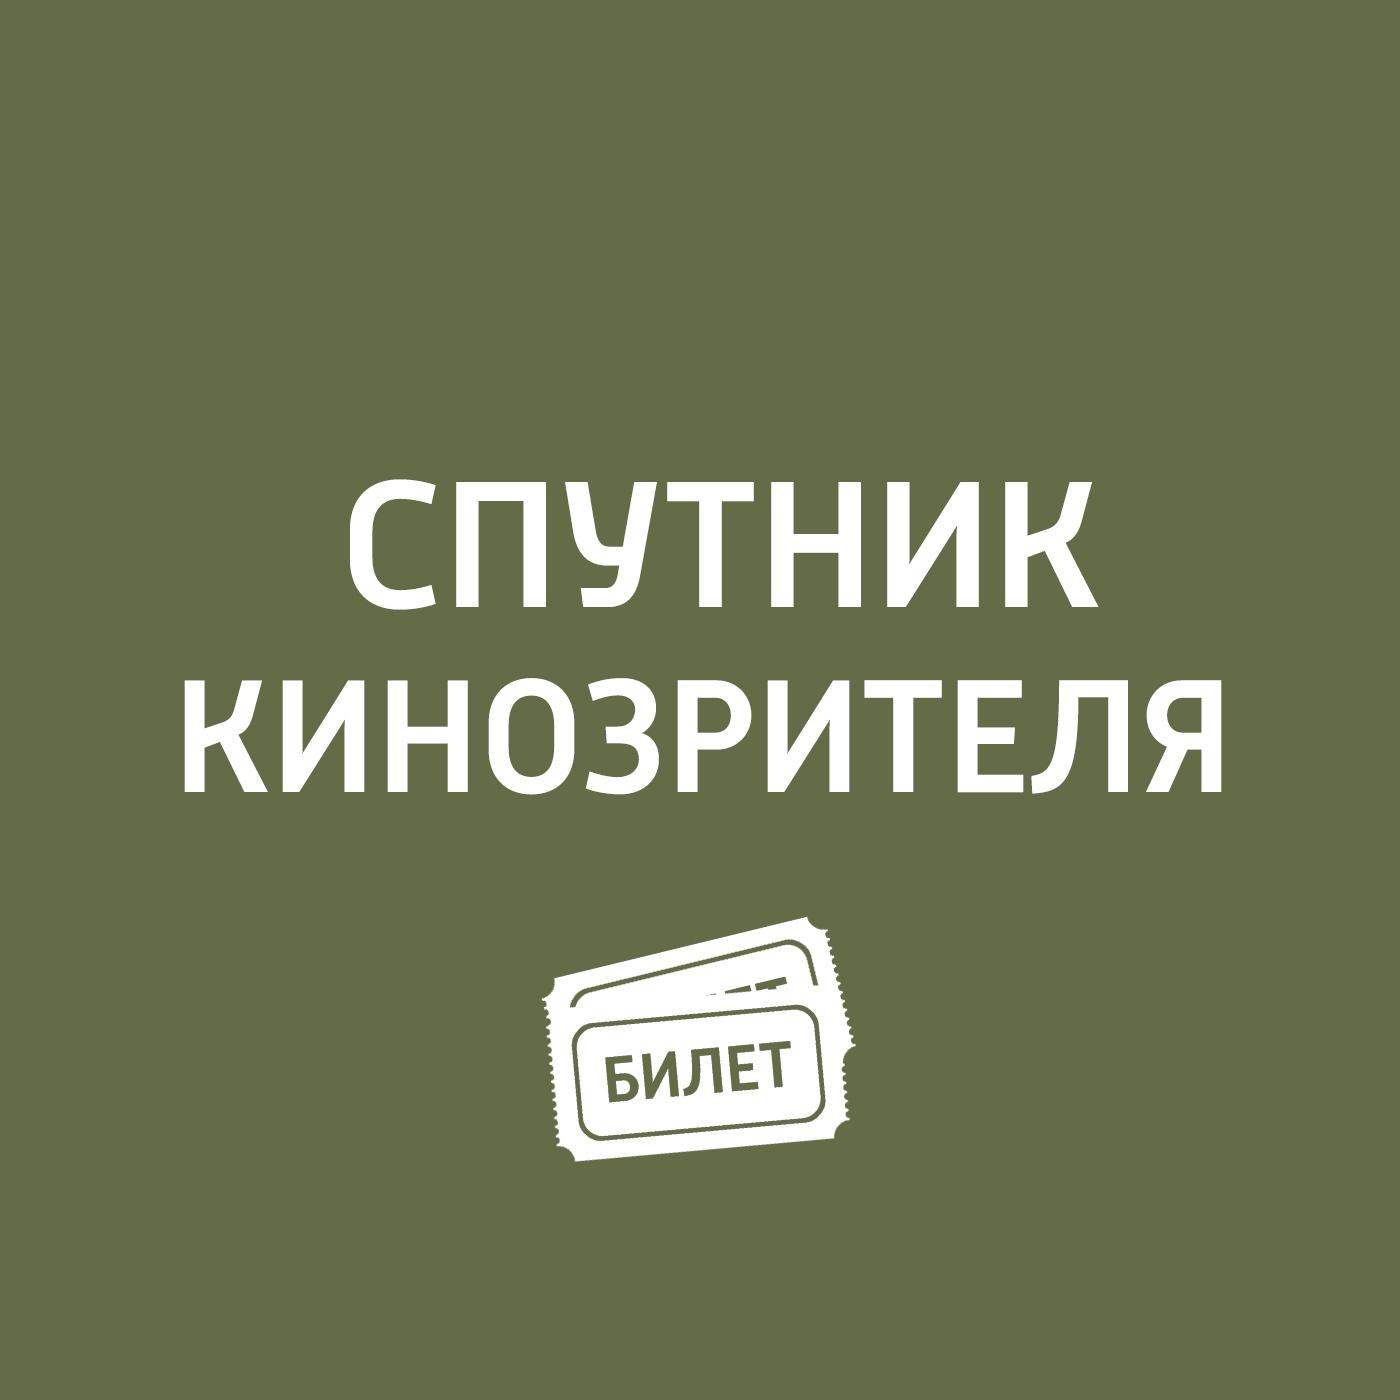 Антон Долин Антон Долин о венецианском кинофестивале антон долин кинотавр 2017